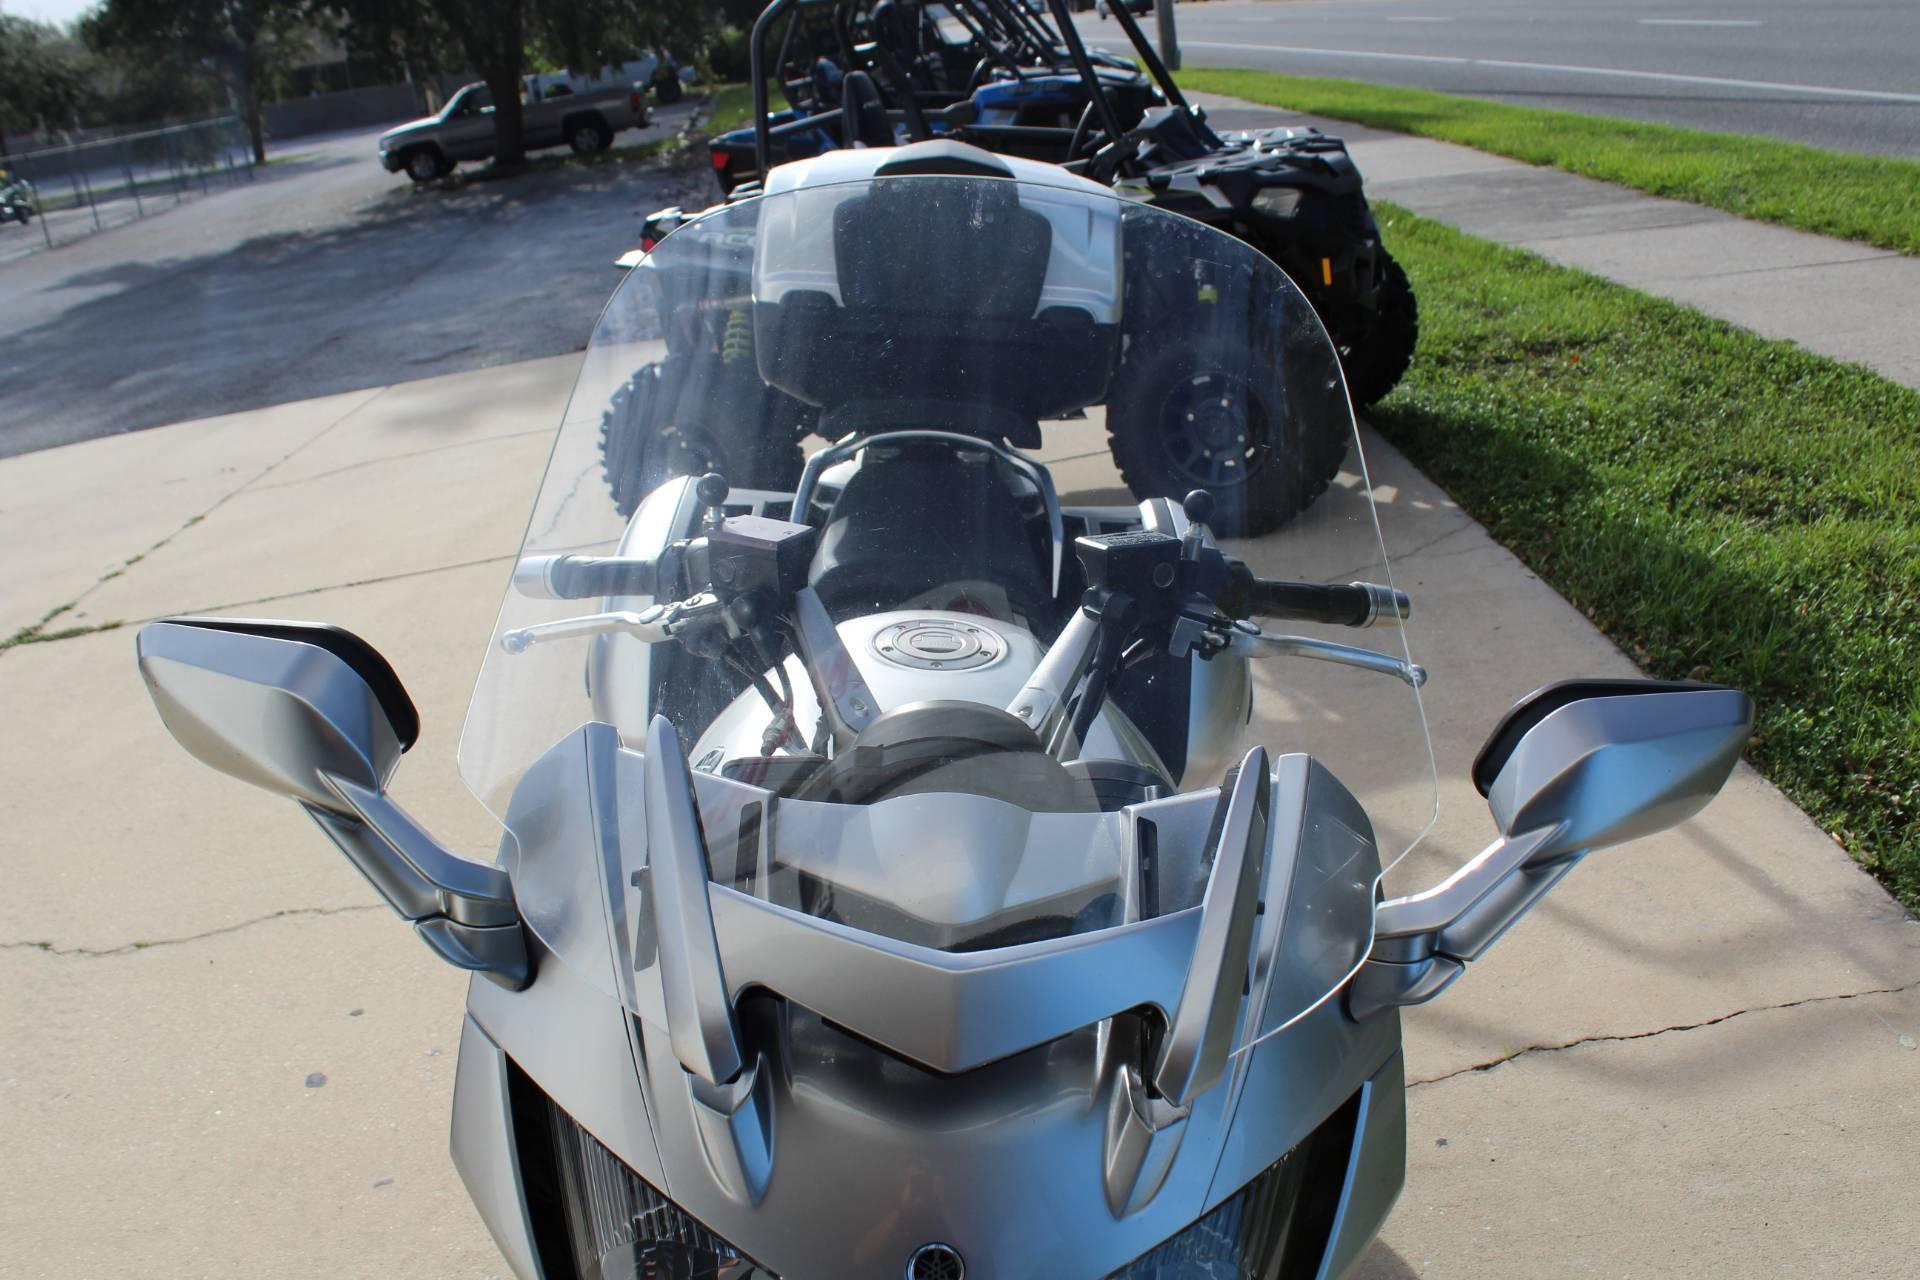 2010 Yamaha FJR1300A 9